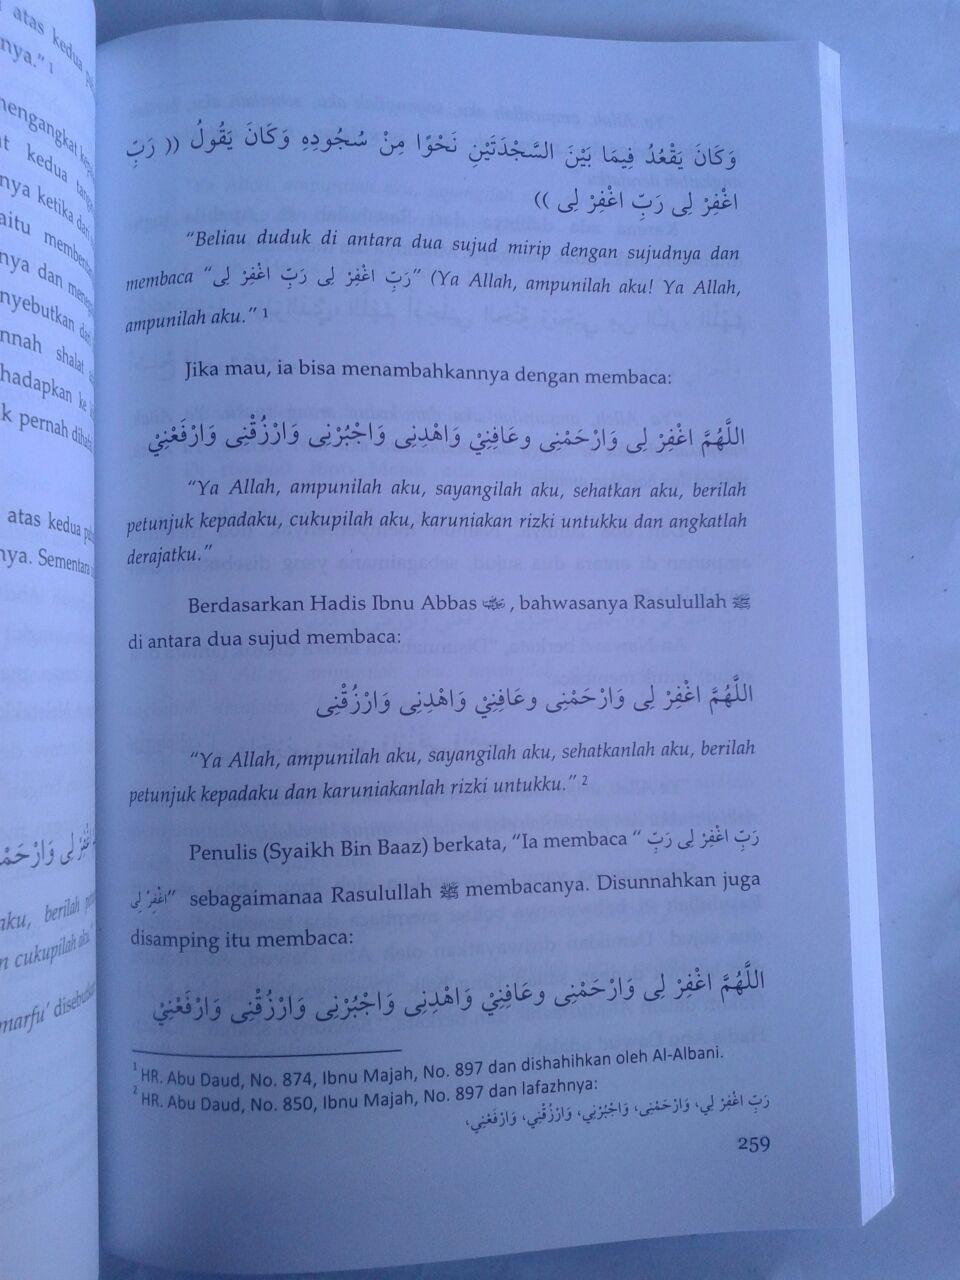 Buku Syarah Kaifiyat Penjelasan Tata Cara Shalat Nabi Syaikh Bin Baz isi 4